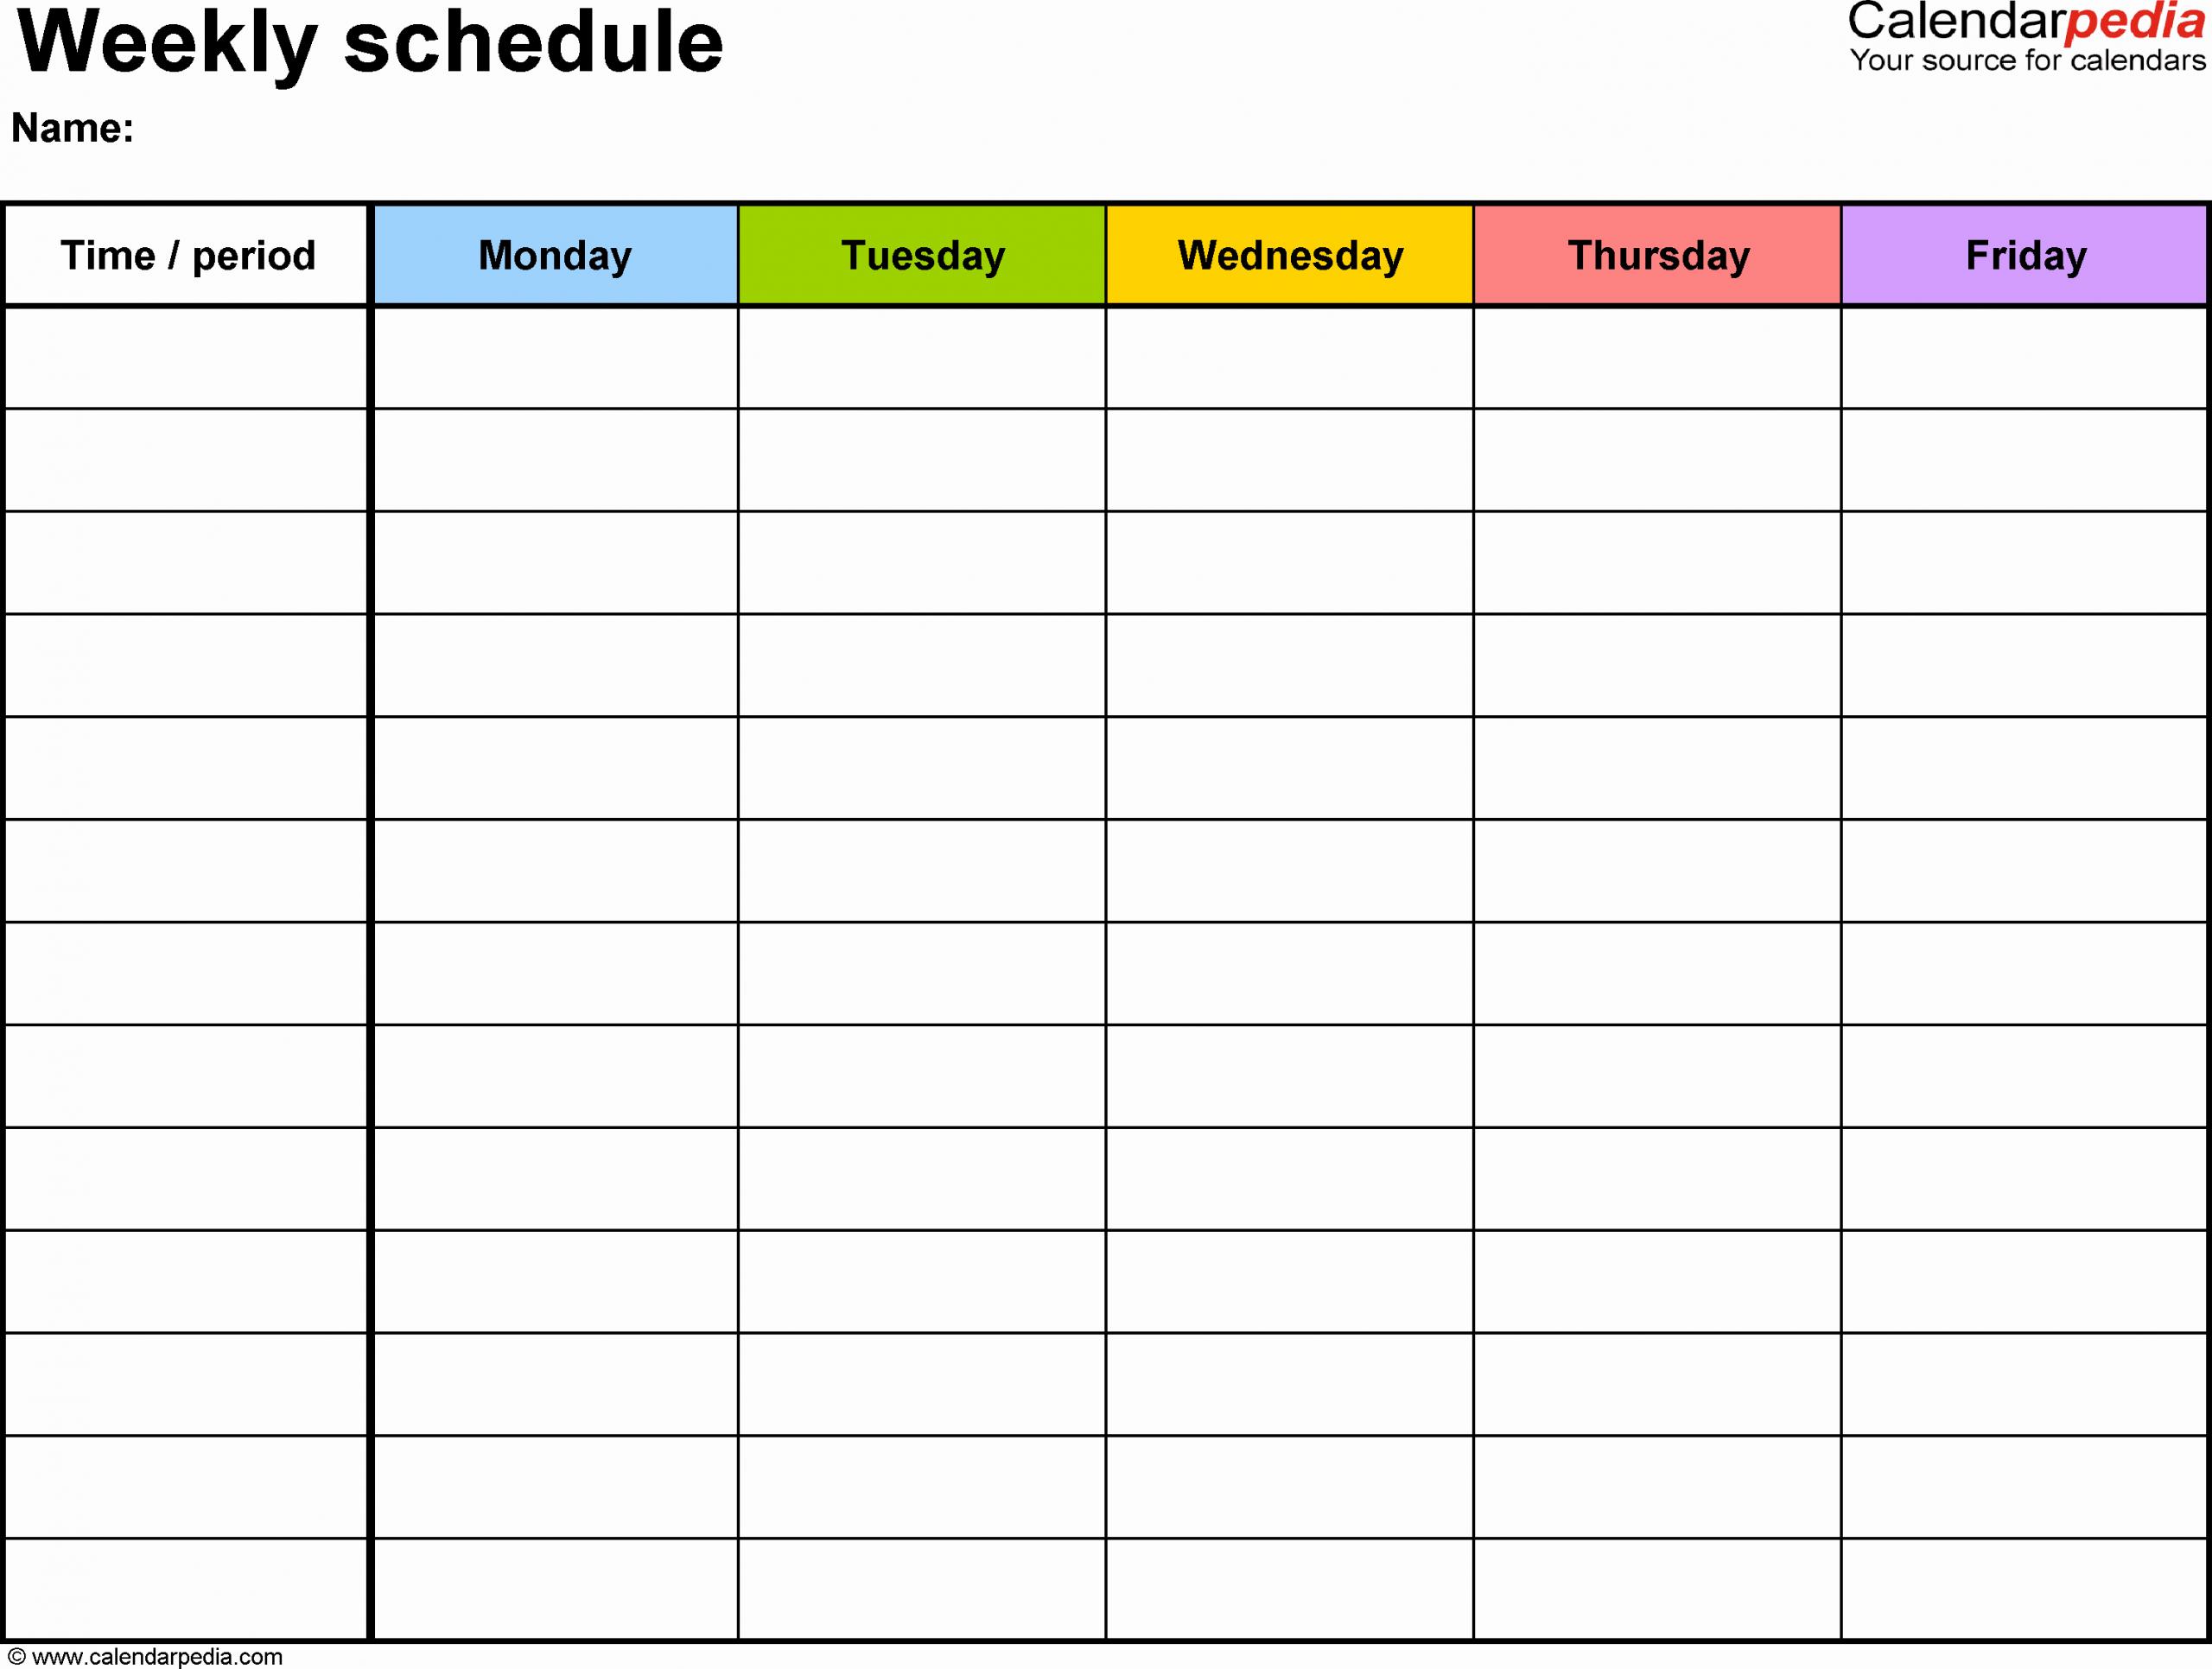 Weekly Schedule Planner Template Beautiful Weekly Schedule Template for Word Version 1 Landscape 1